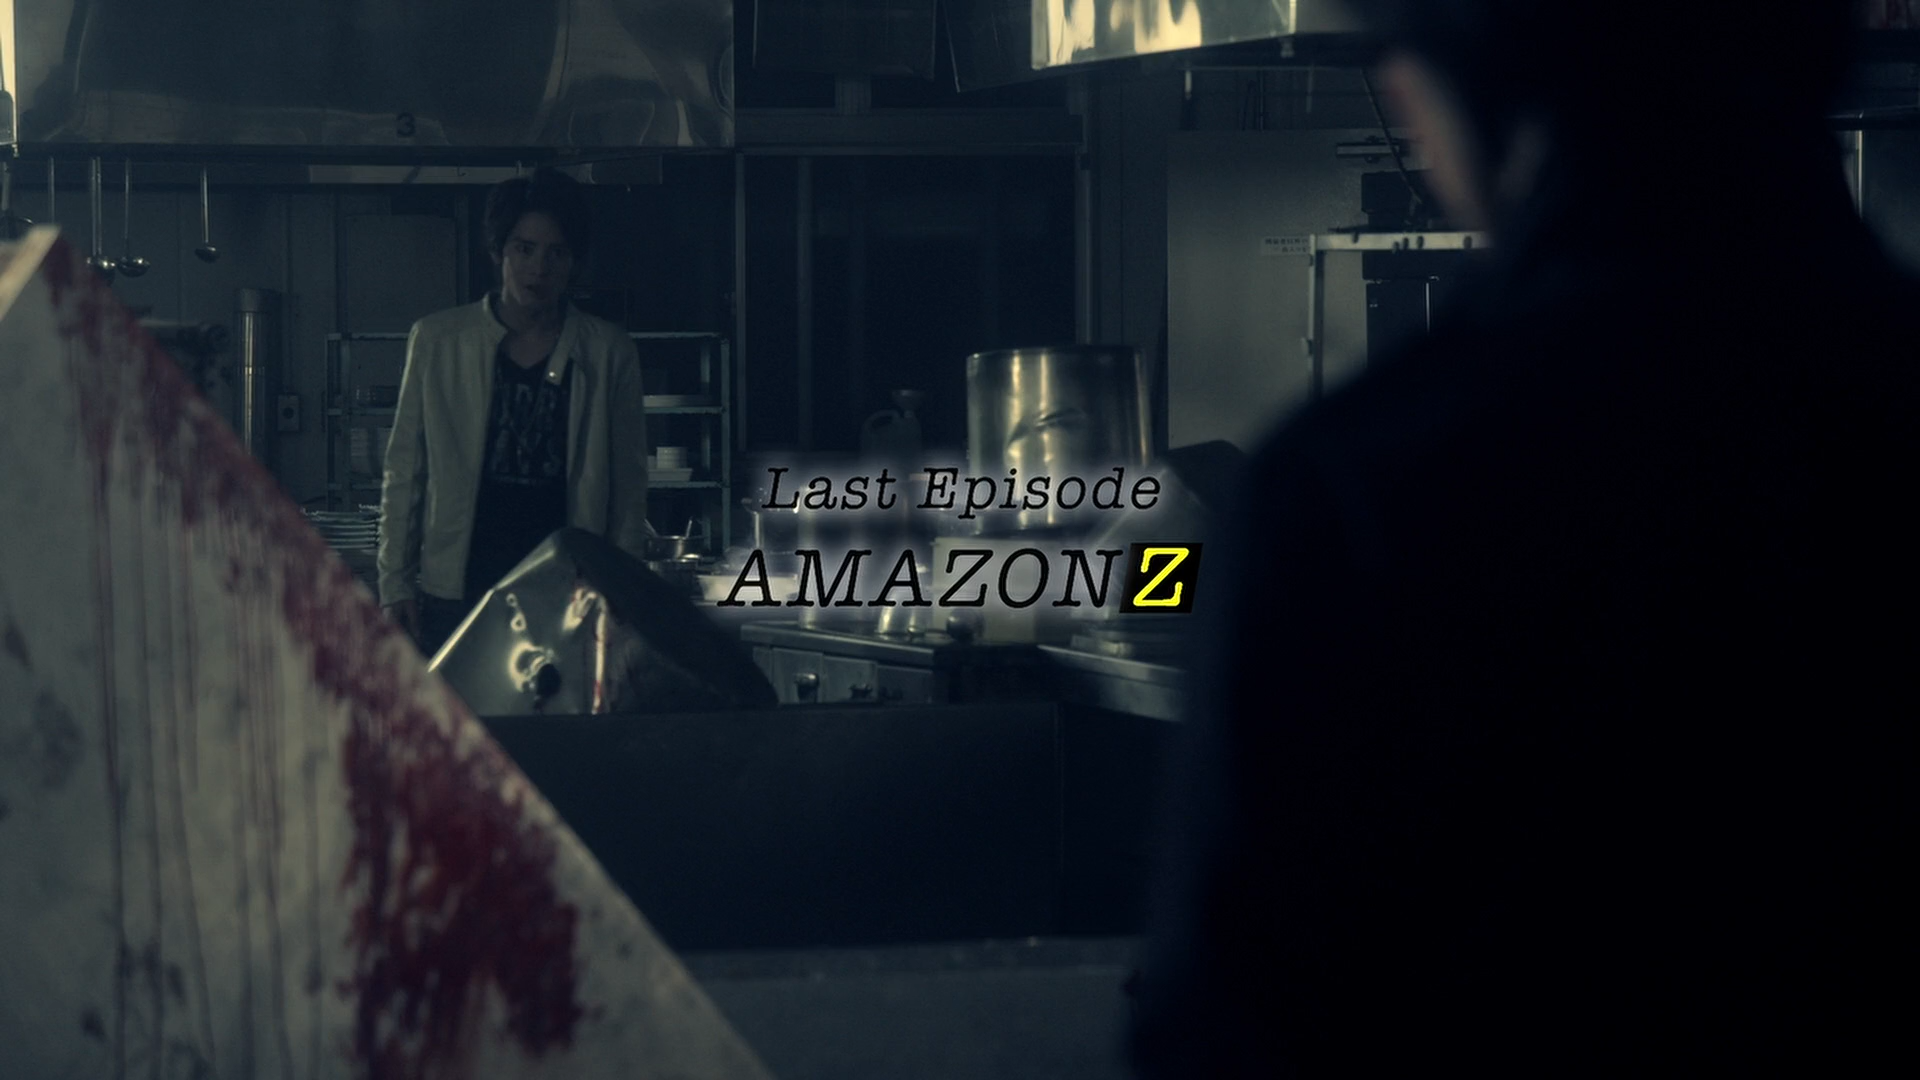 AMAZONZ (season 2)